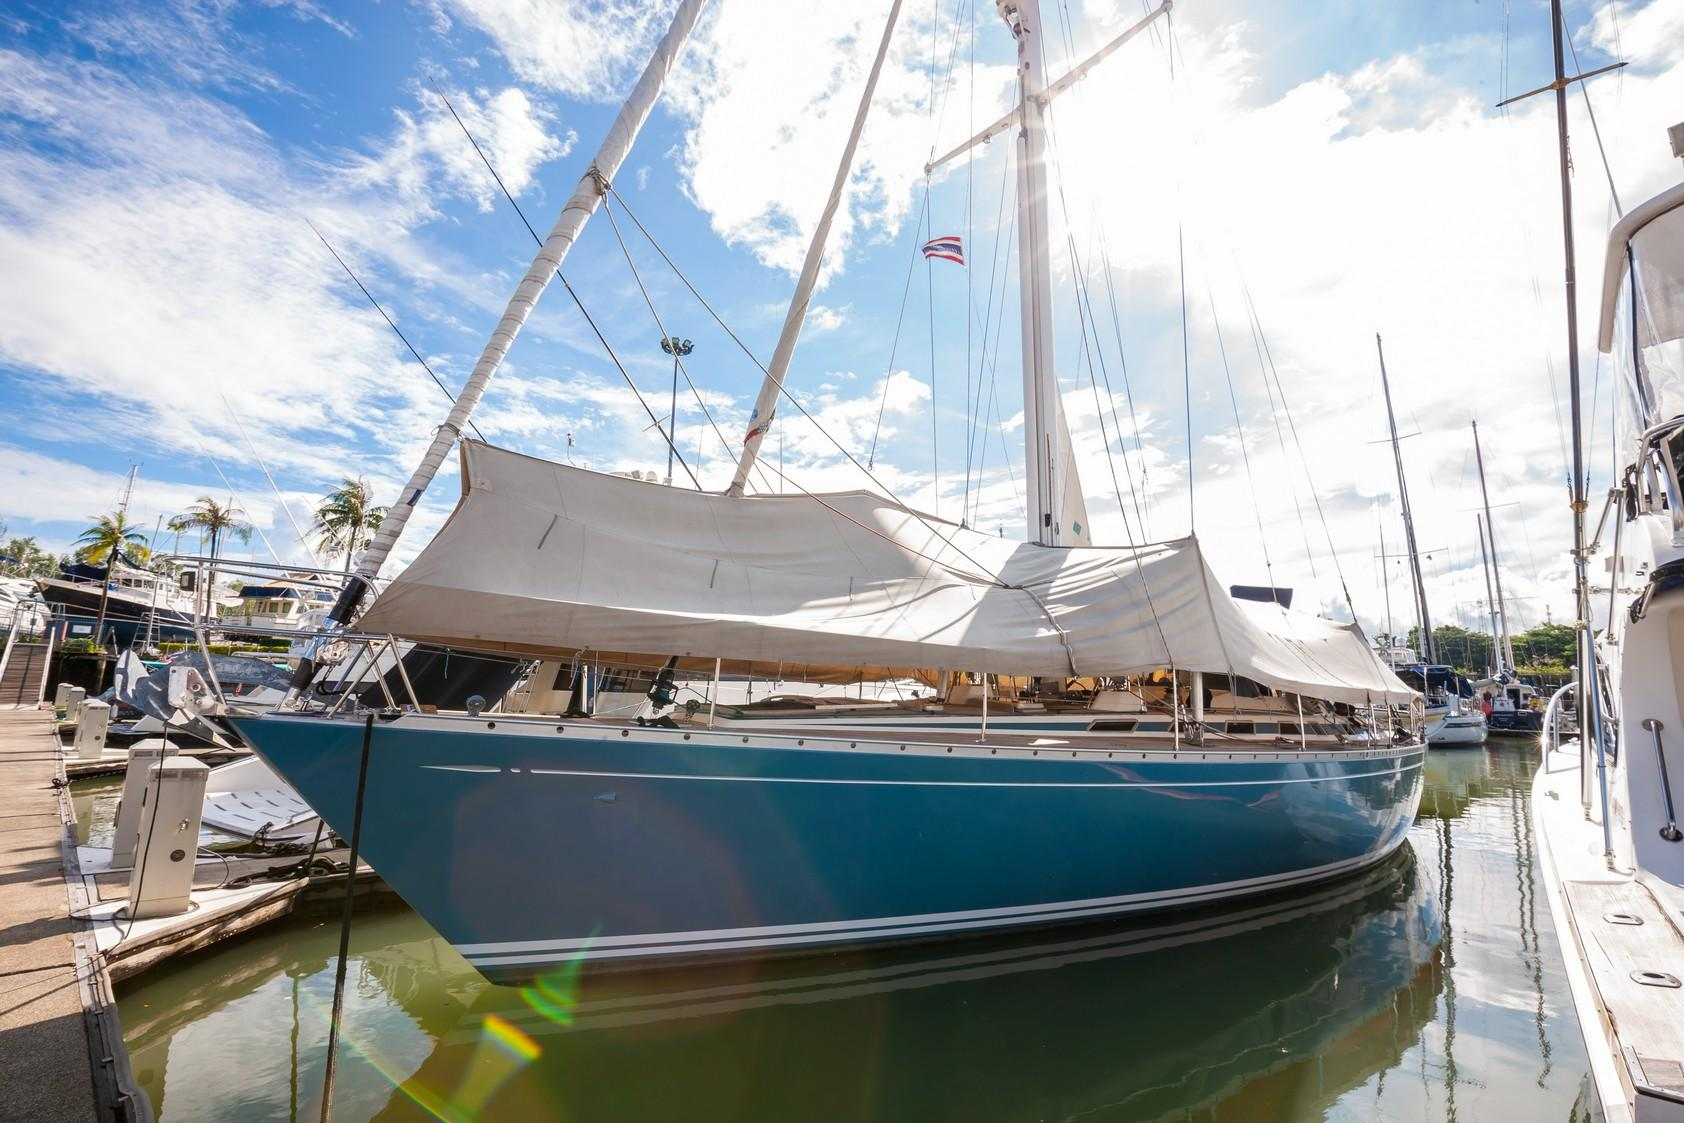 1989 Swan 61 Sail Boat For Sale Wwwyachtworldcom